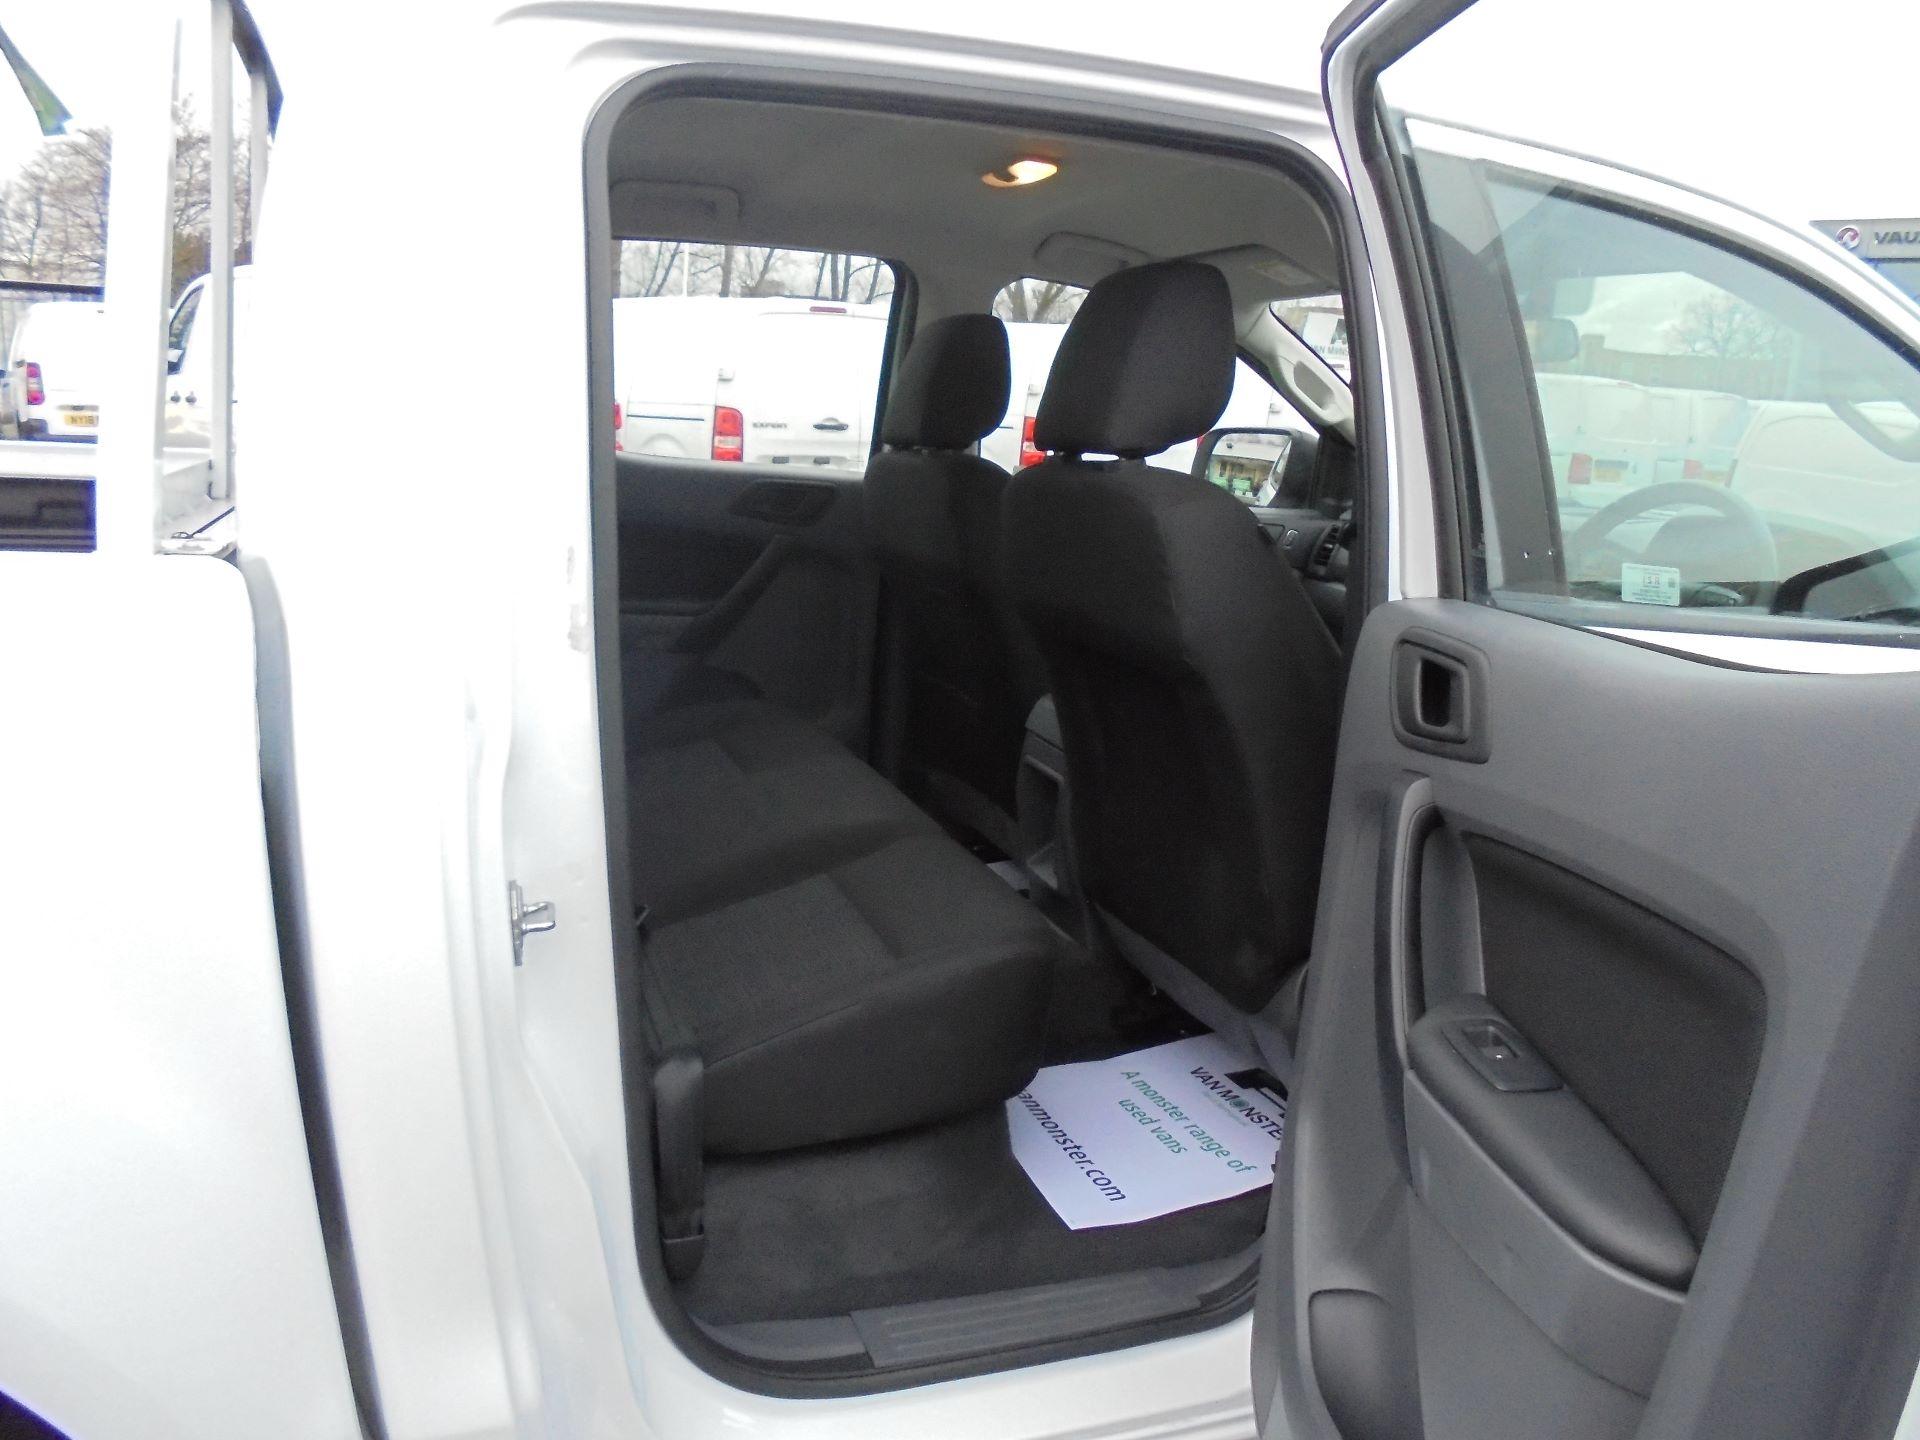 2016 Ford Ranger PICKUP 4X4 XL 2.2 TDCI D/C 160PS EURO 5 (OY66GSU) Image 12